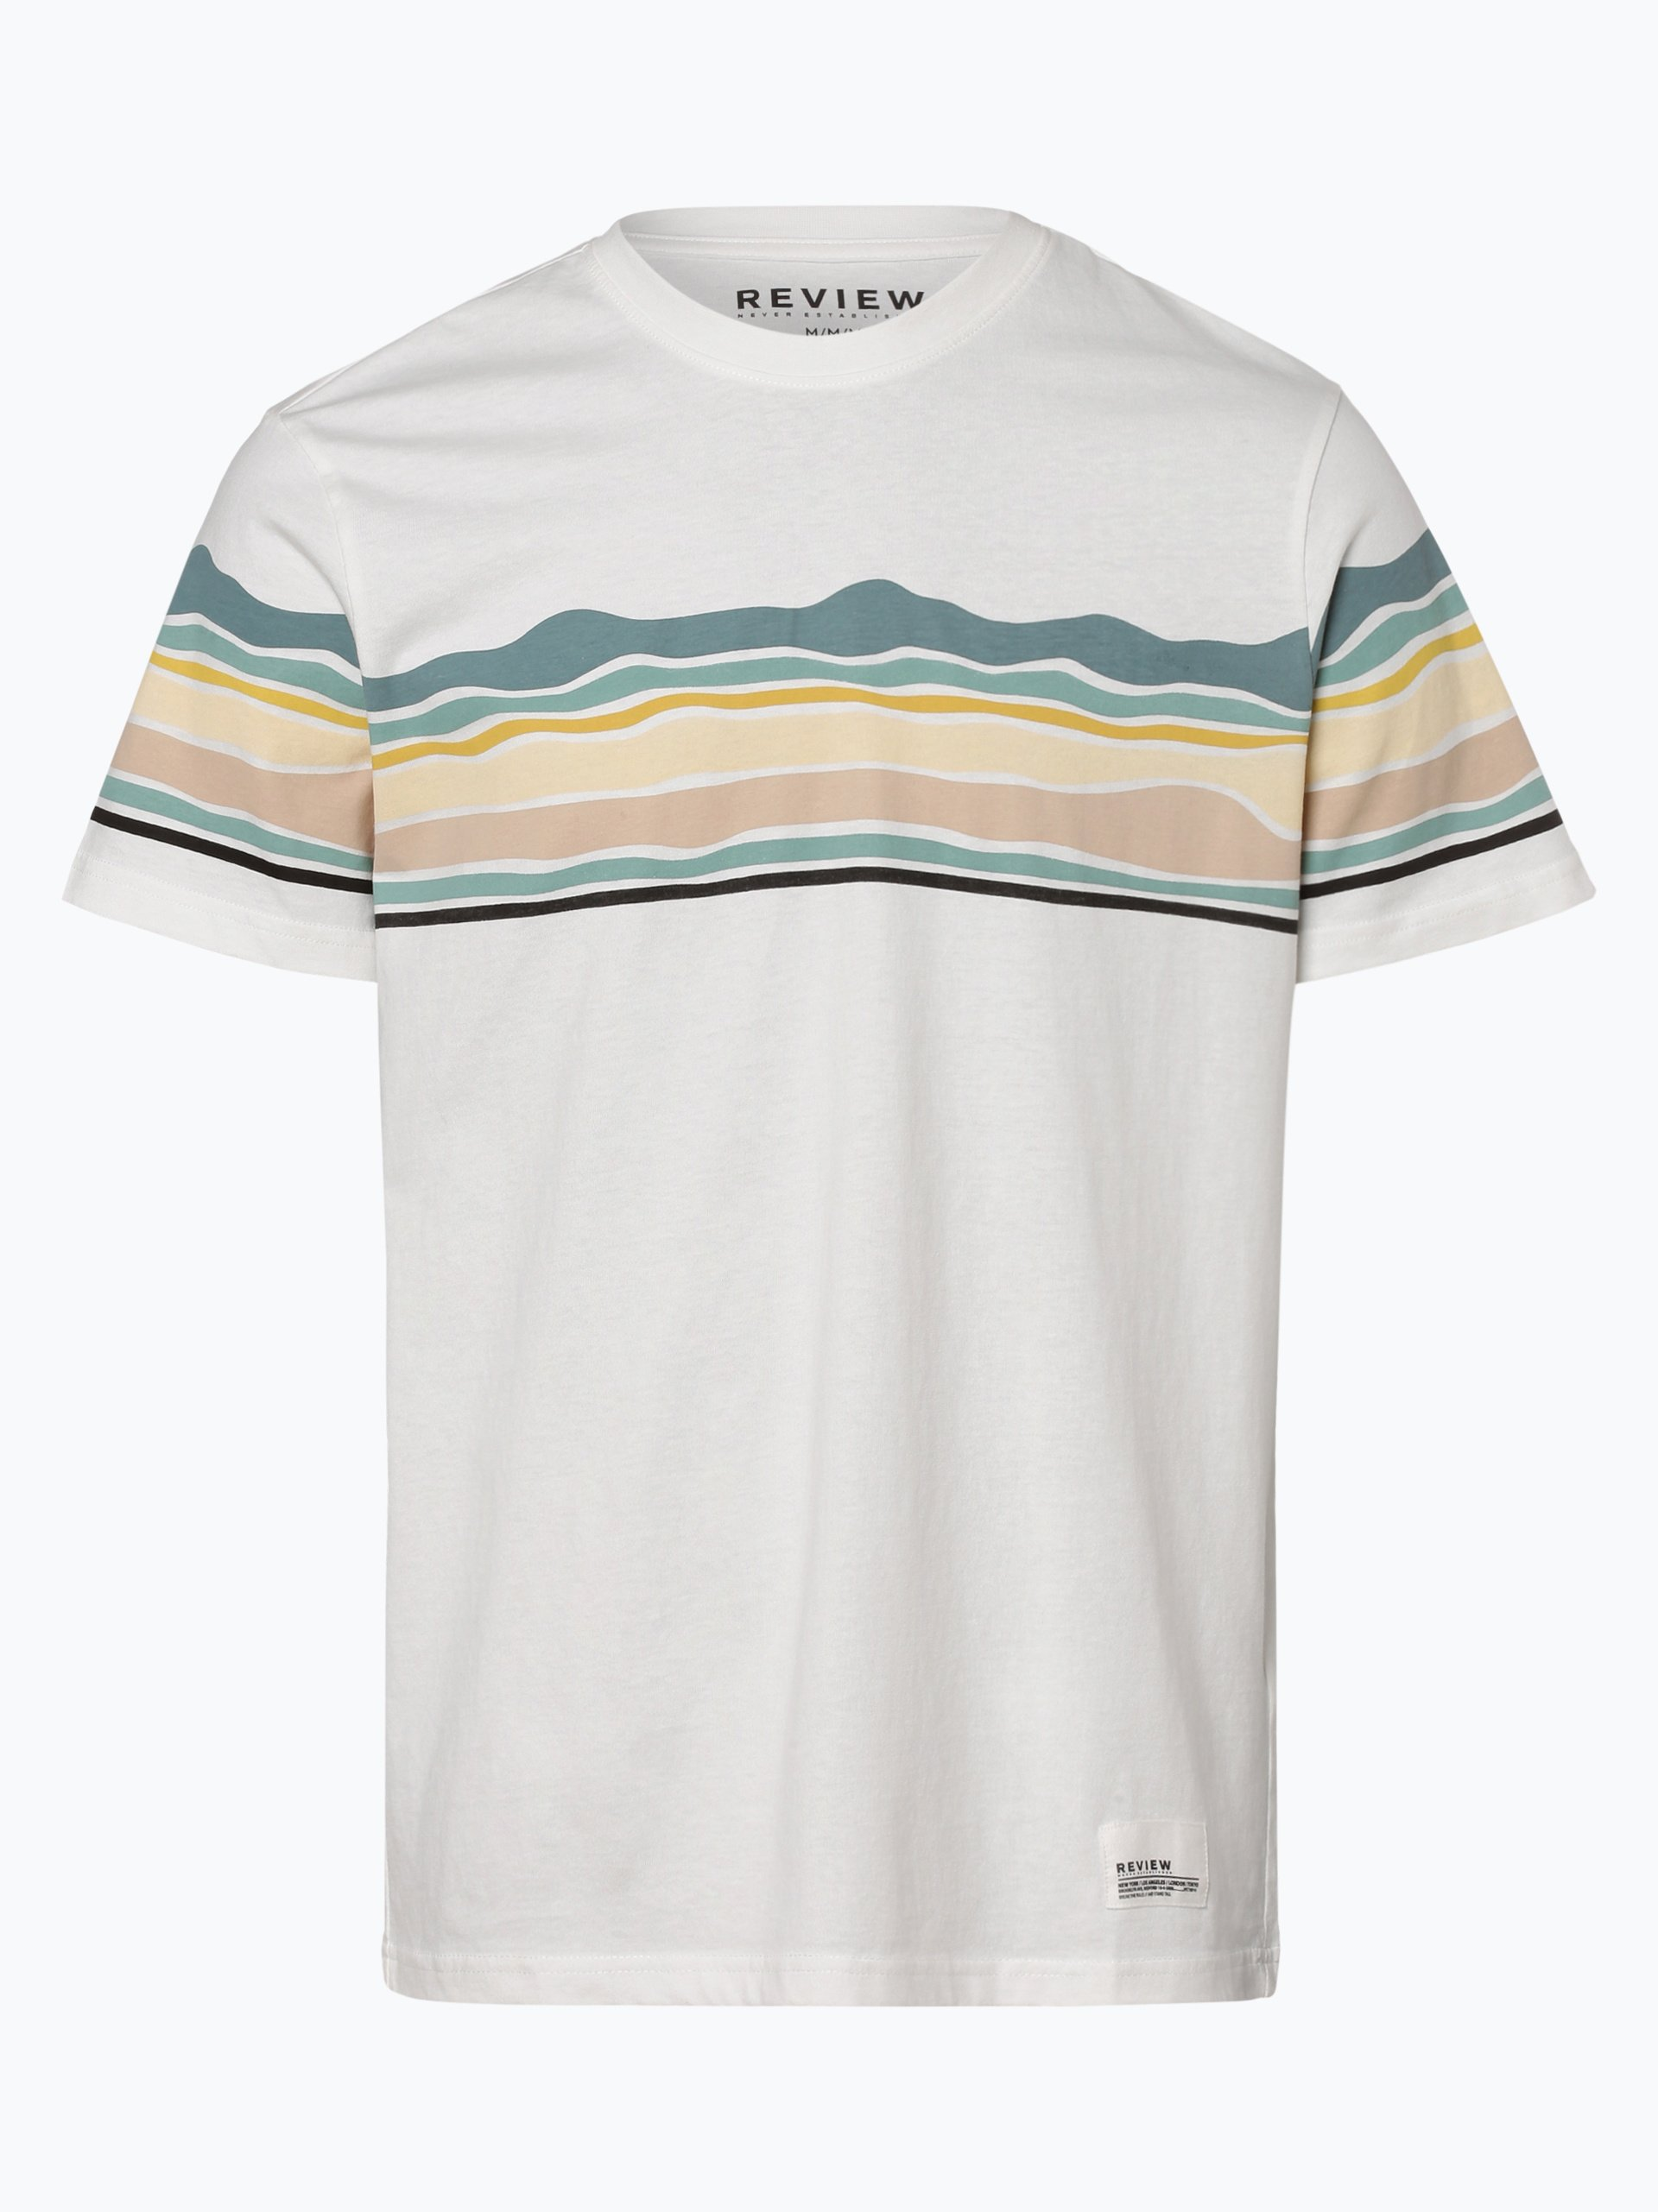 Review T-shirt męski